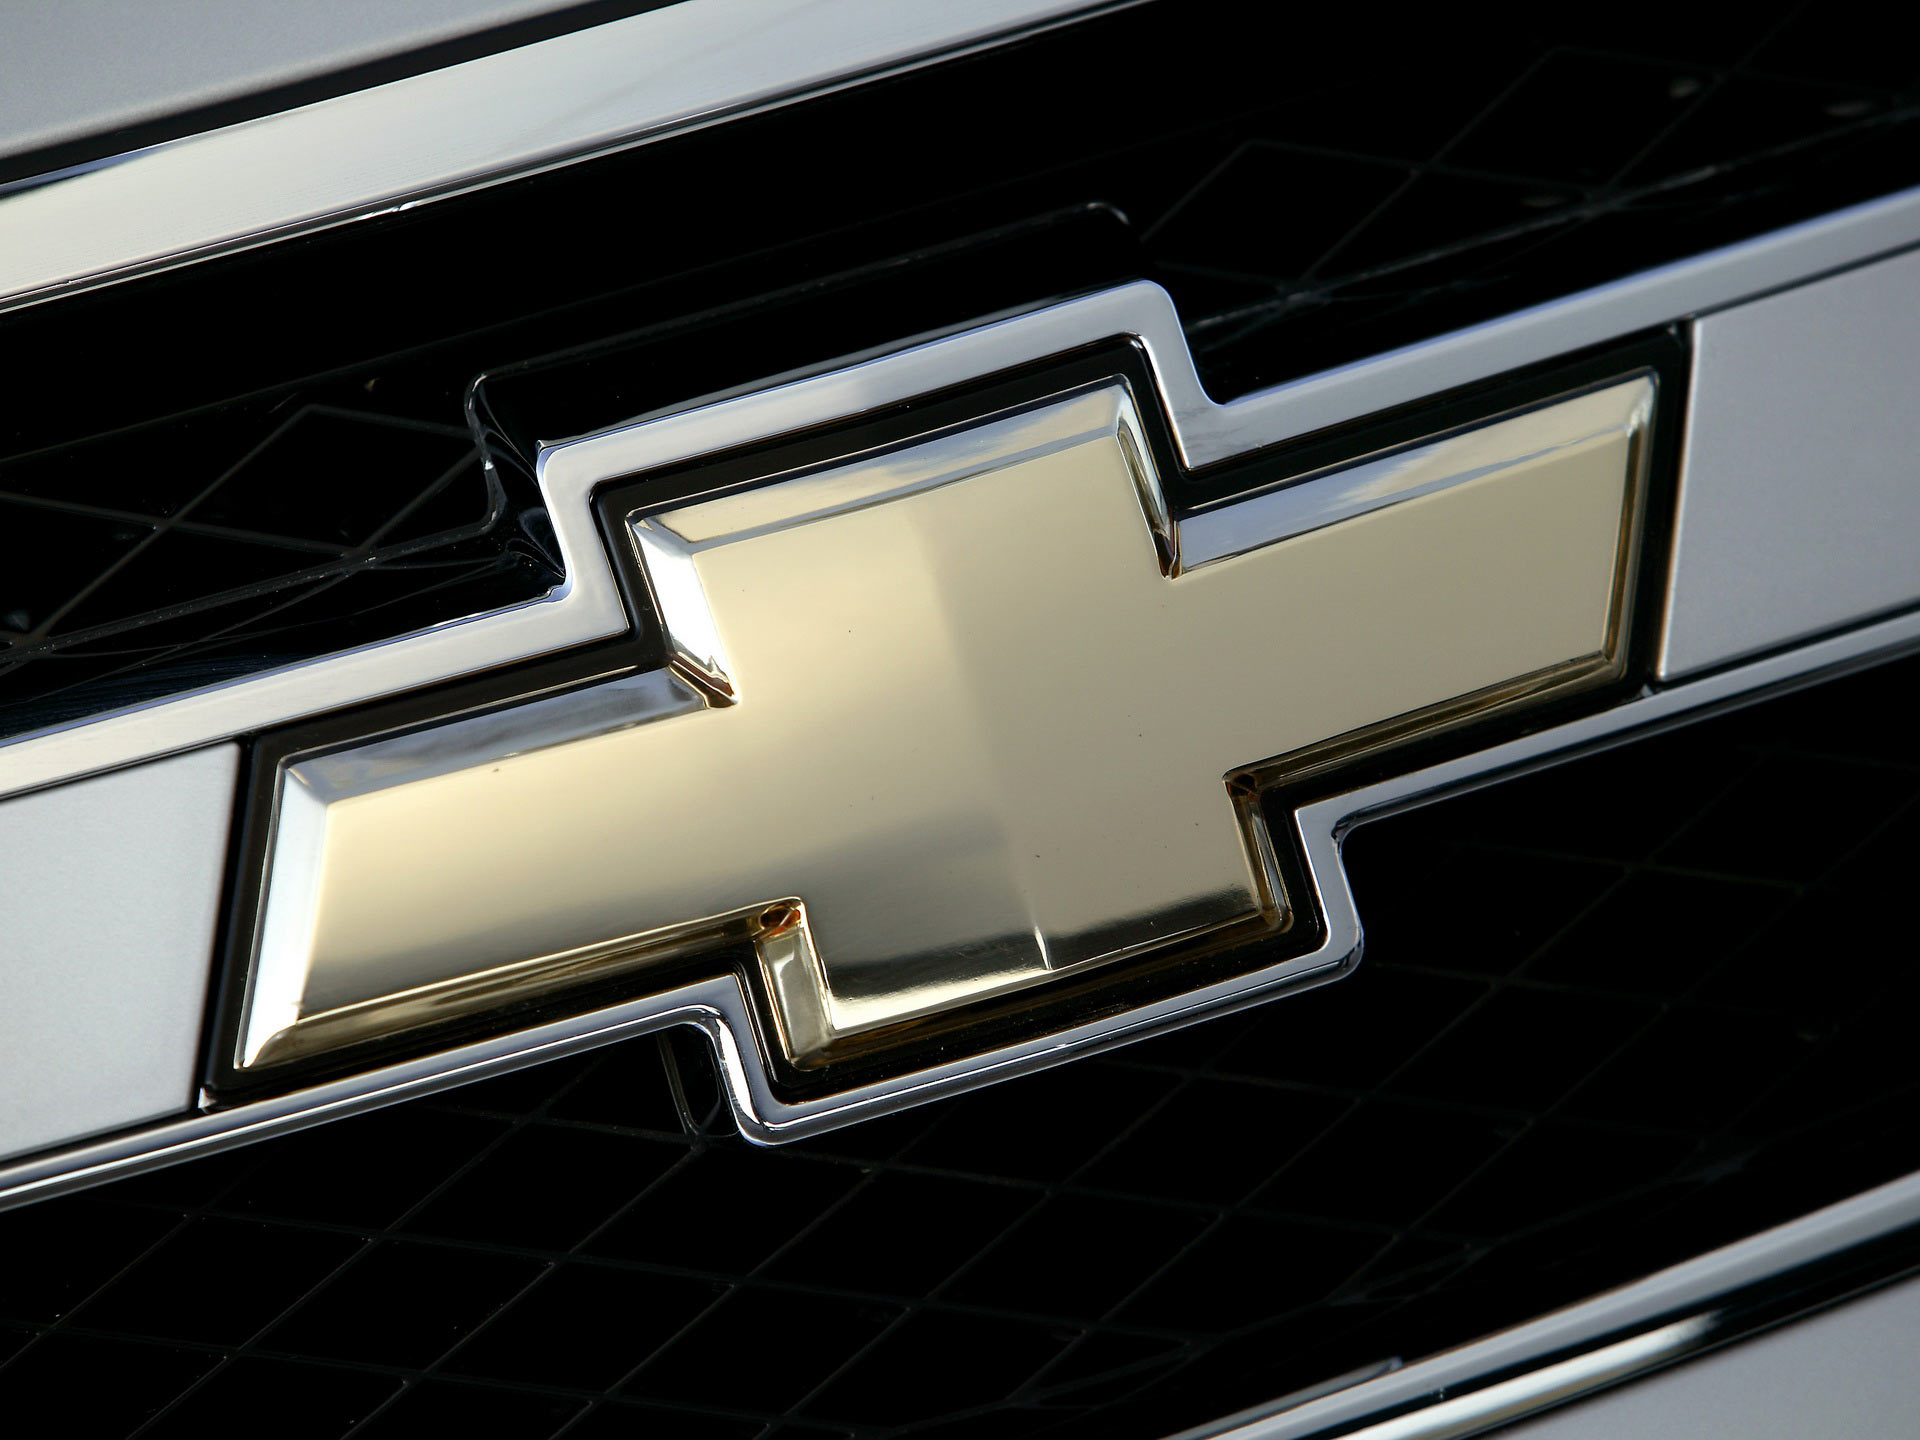 Chevrolet Chevy Silverado 2014 HD Wallpaper Chevrolet Chevy Silverado 1920x1440